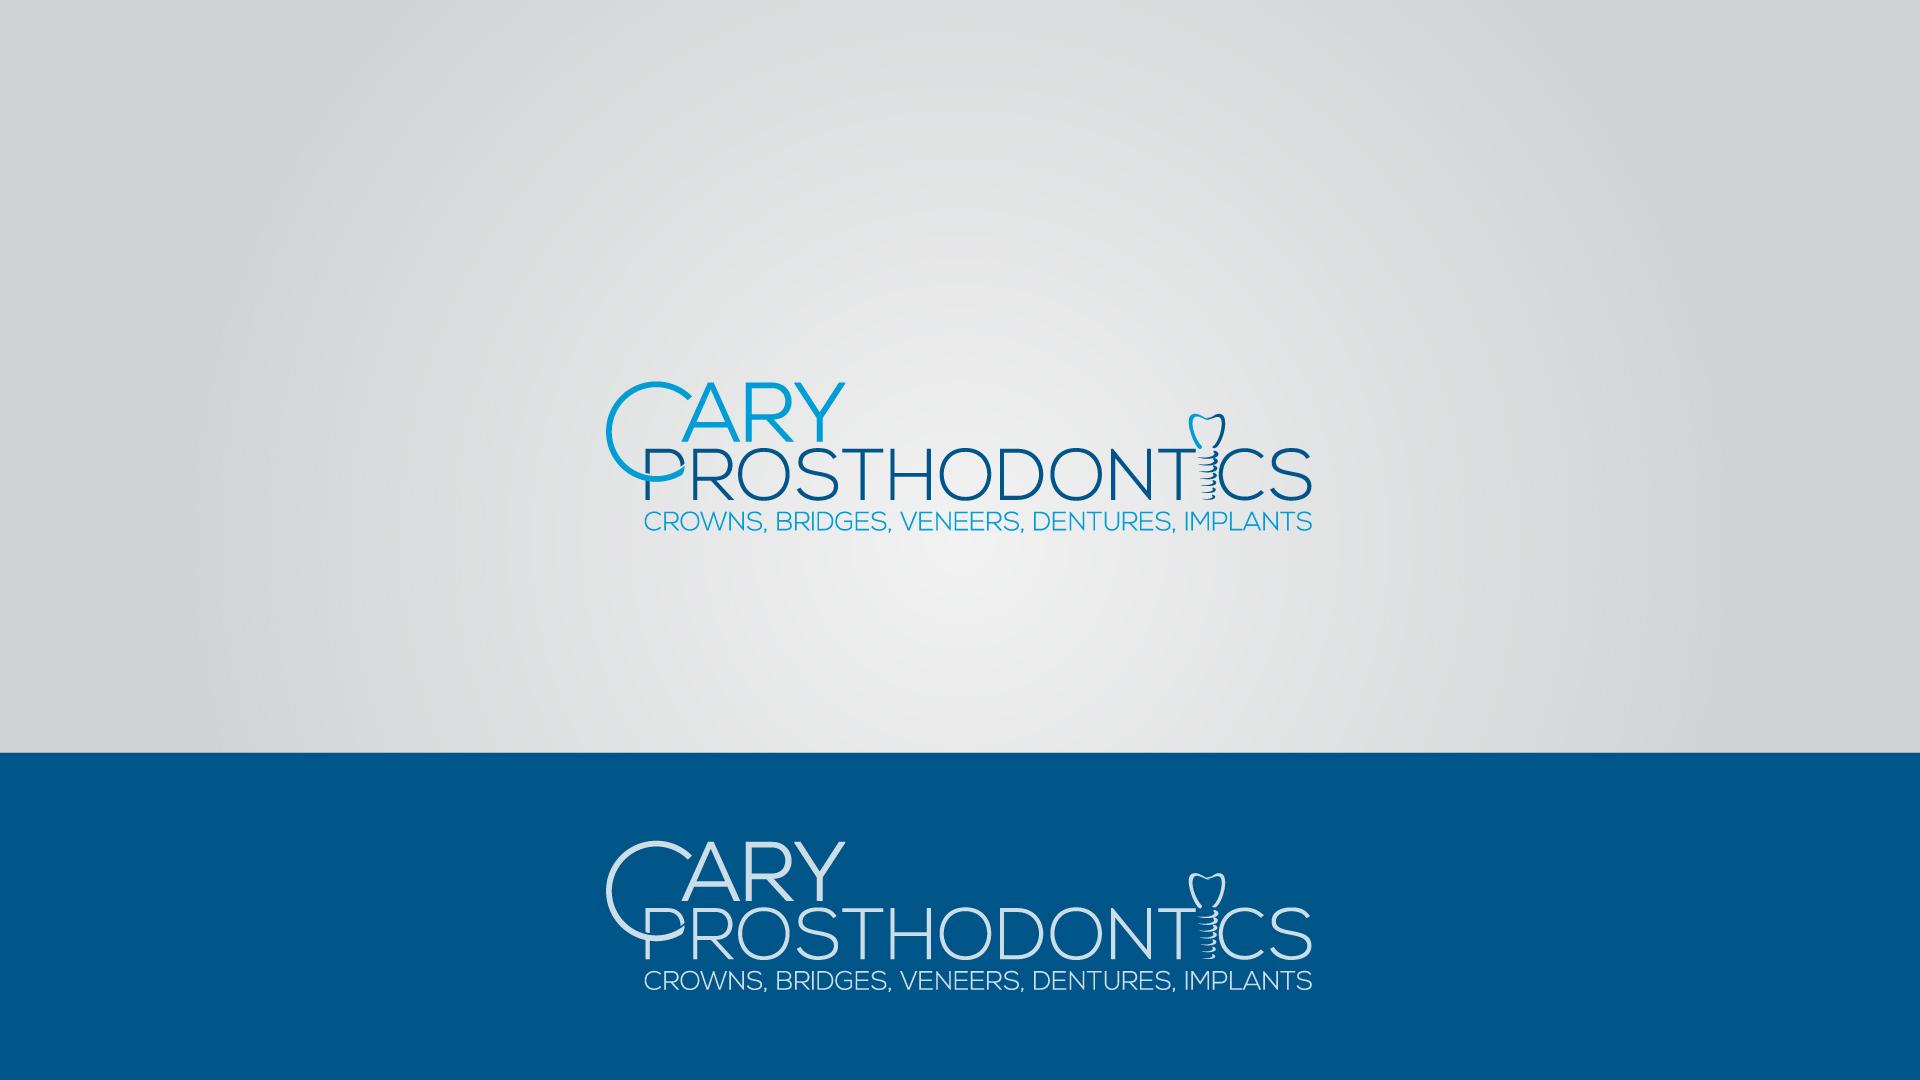 Logo Design by MD SHOHIDUL ISLAM - Entry No. 210 in the Logo Design Contest Cary Prosthodontics Logo Design.